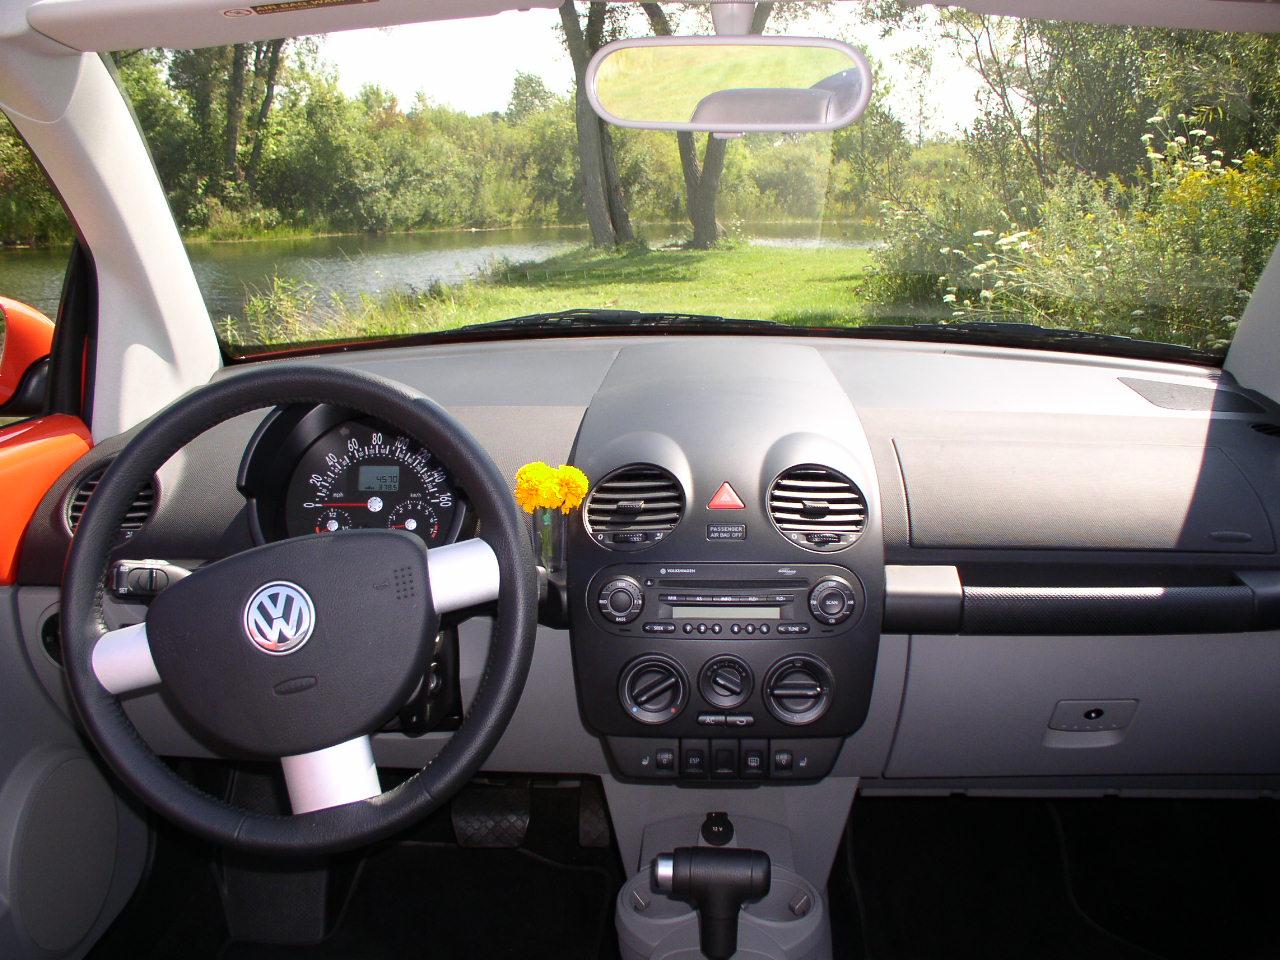 hight resolution of 2004 volkswagen new beetle cabriolet turbo fordatlasconcept007